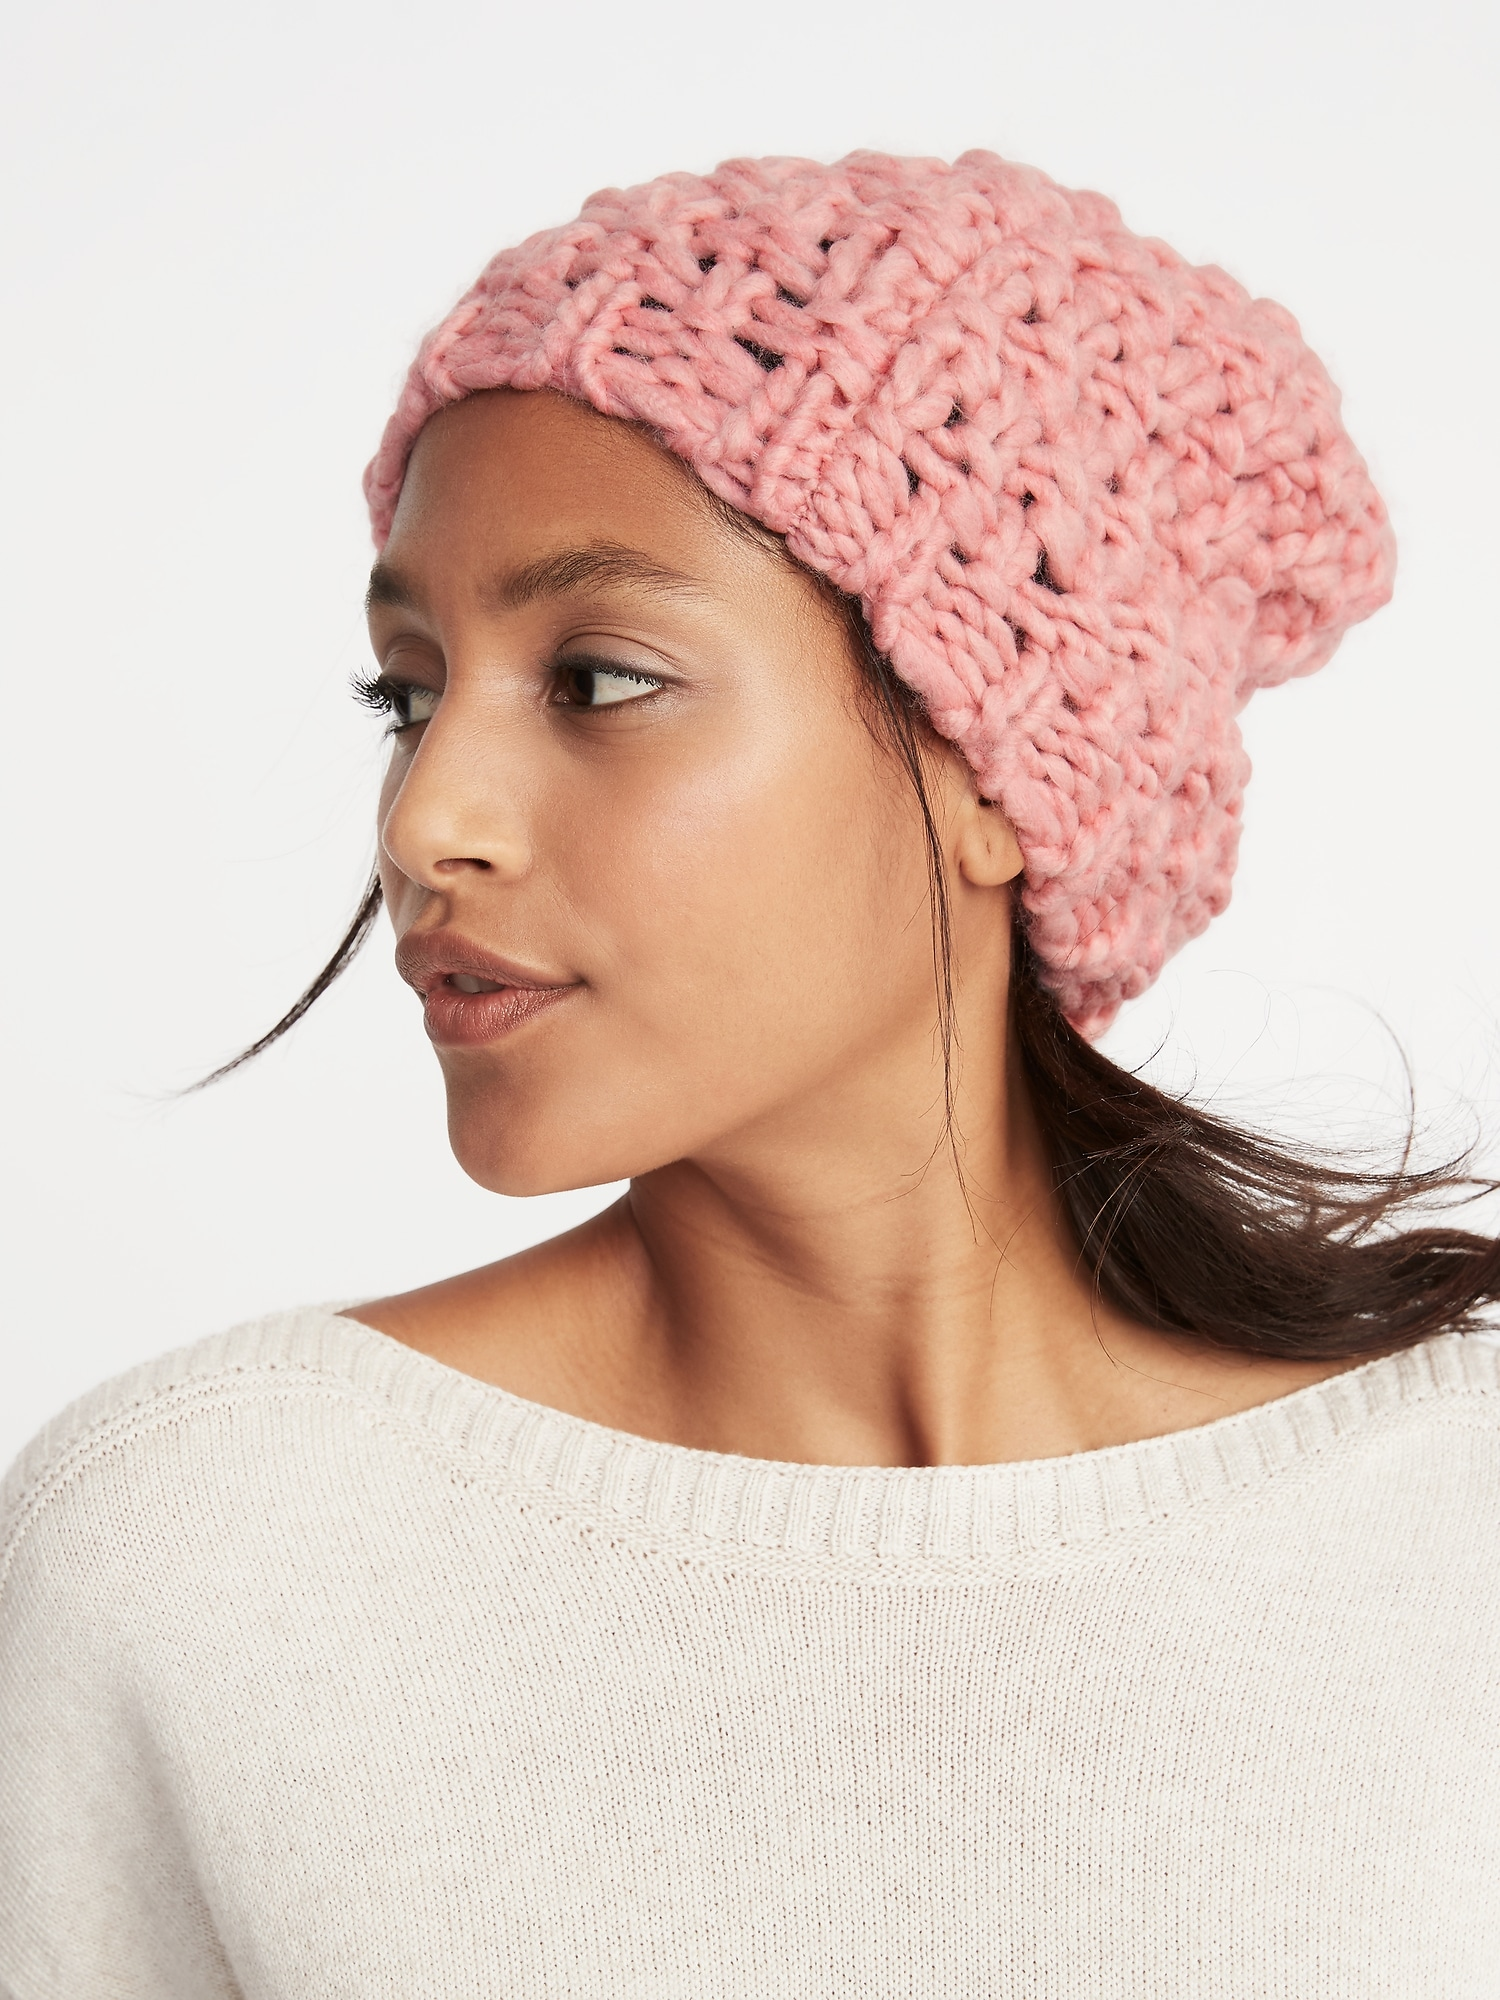 baa52e19201 Textured Basket-Weave Beanie for Women